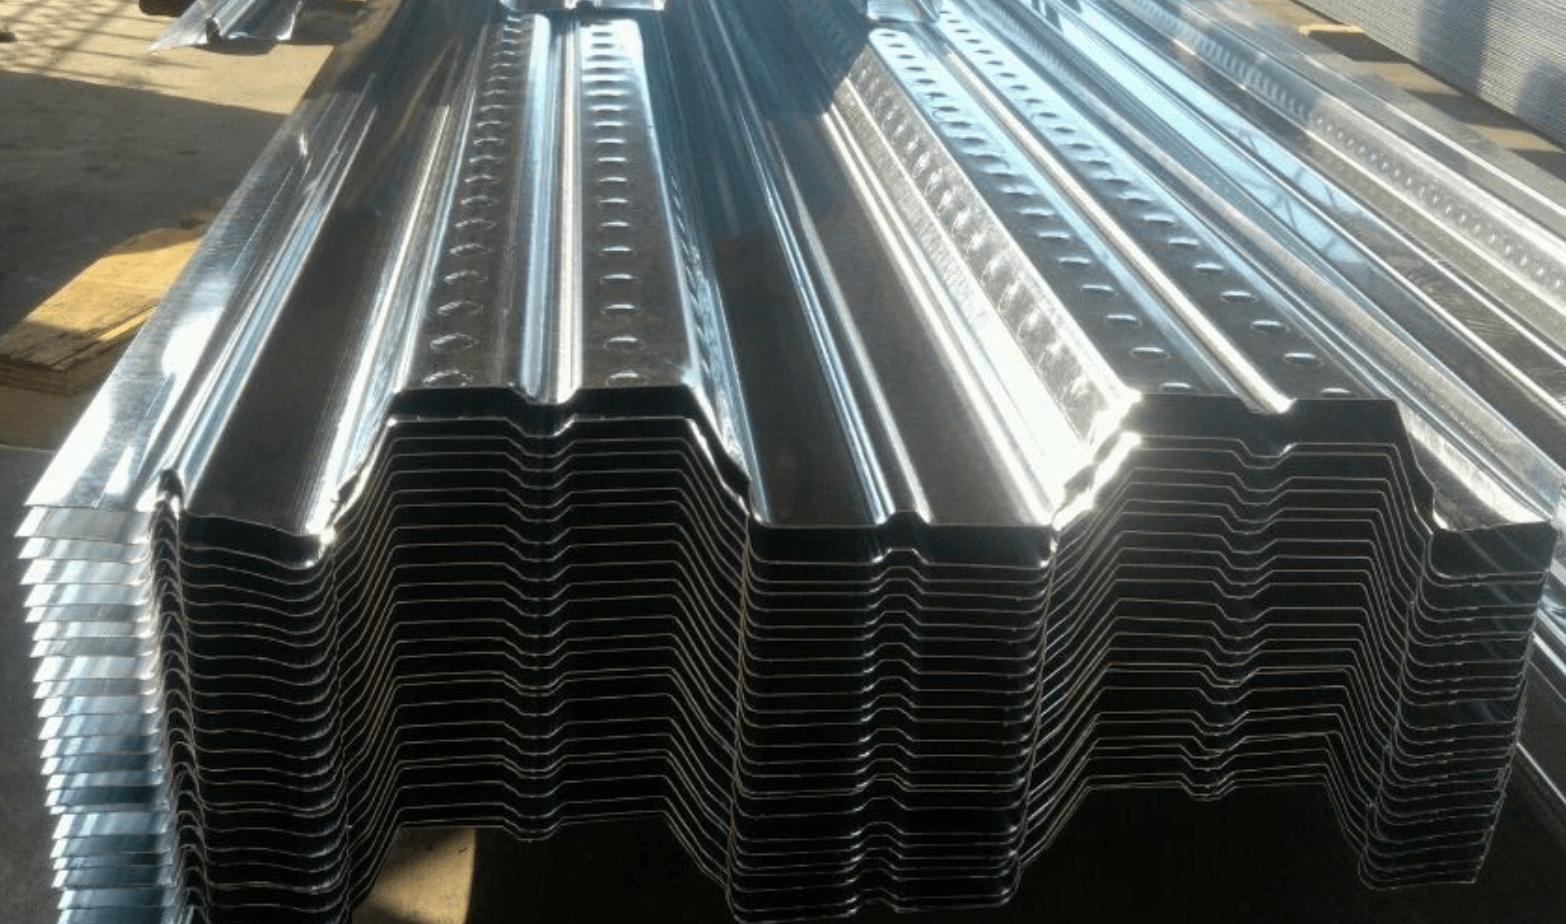 harga atap baja ringan paling murah 5 daftar berbagai merk terbaru 2019